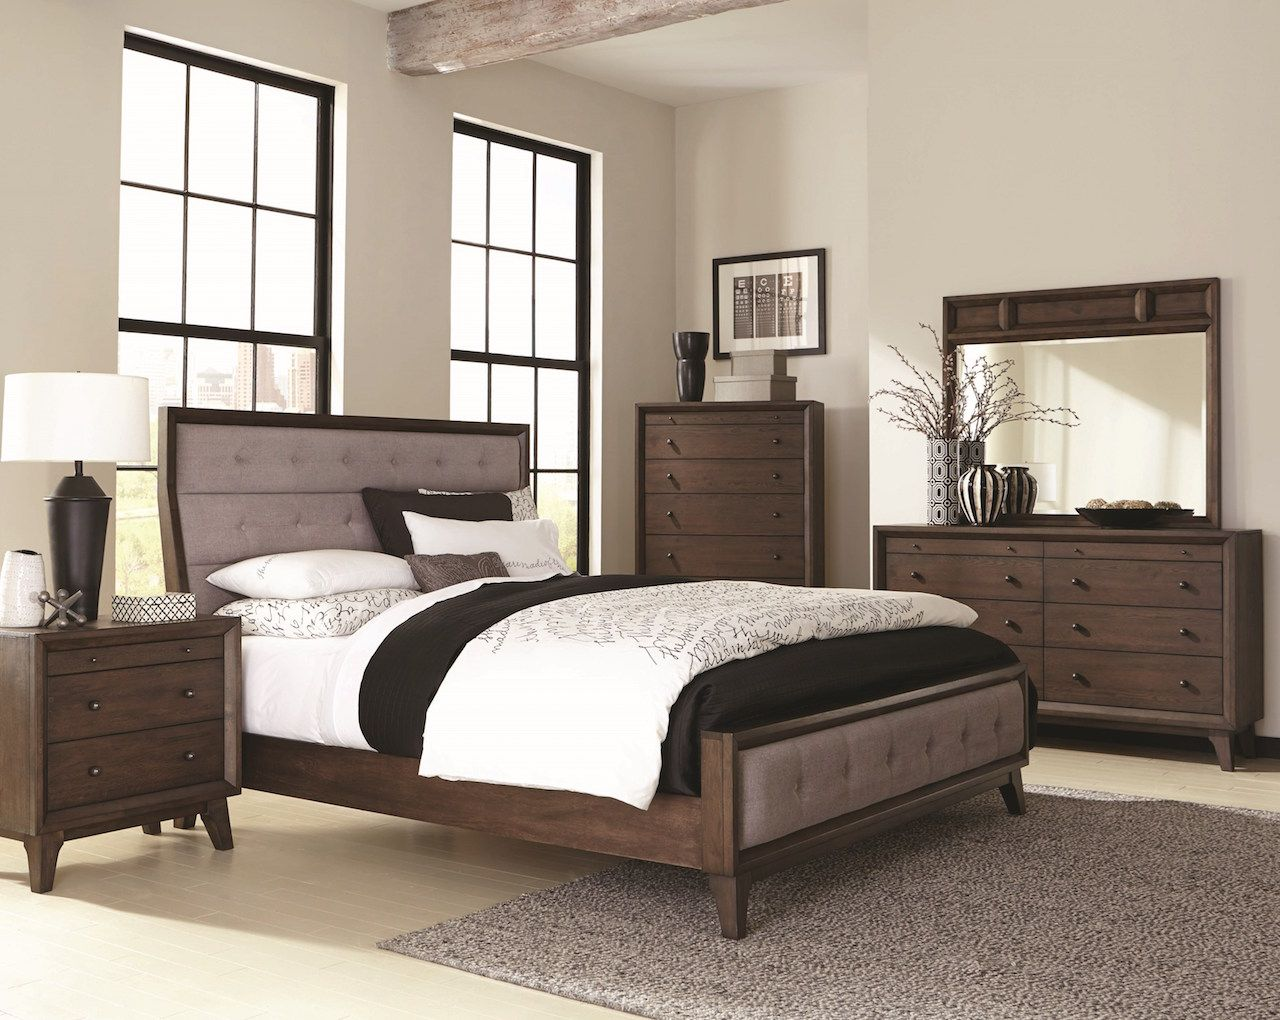 Bingham Collection B259 By Coaster Bedroom Set Bedroom Sets